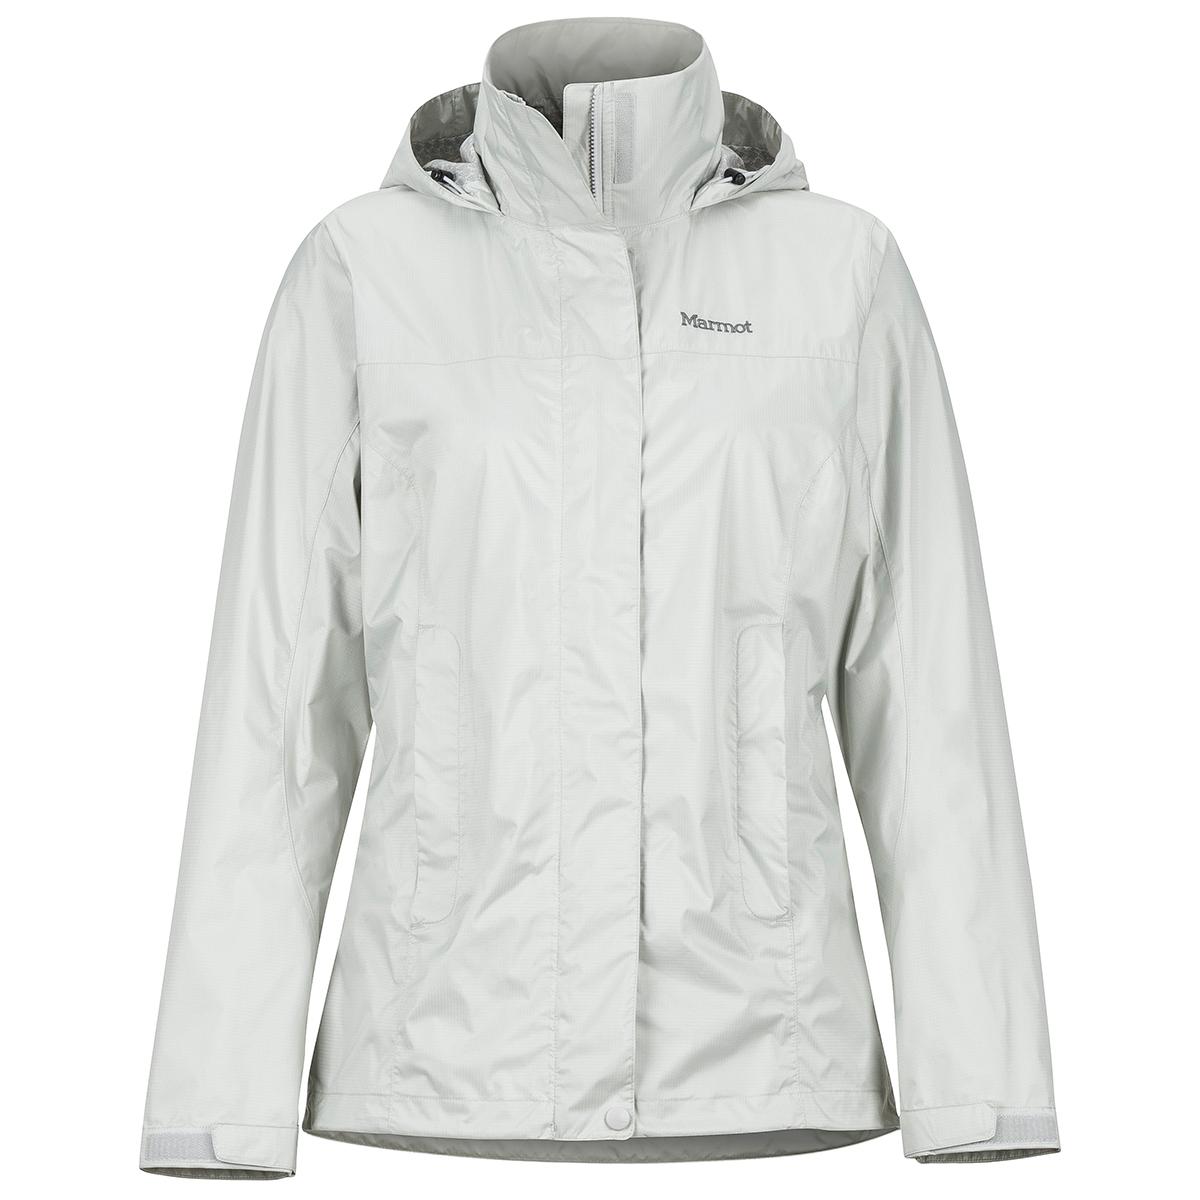 Marmot Women's Precip Eco Jacket - Black, XL